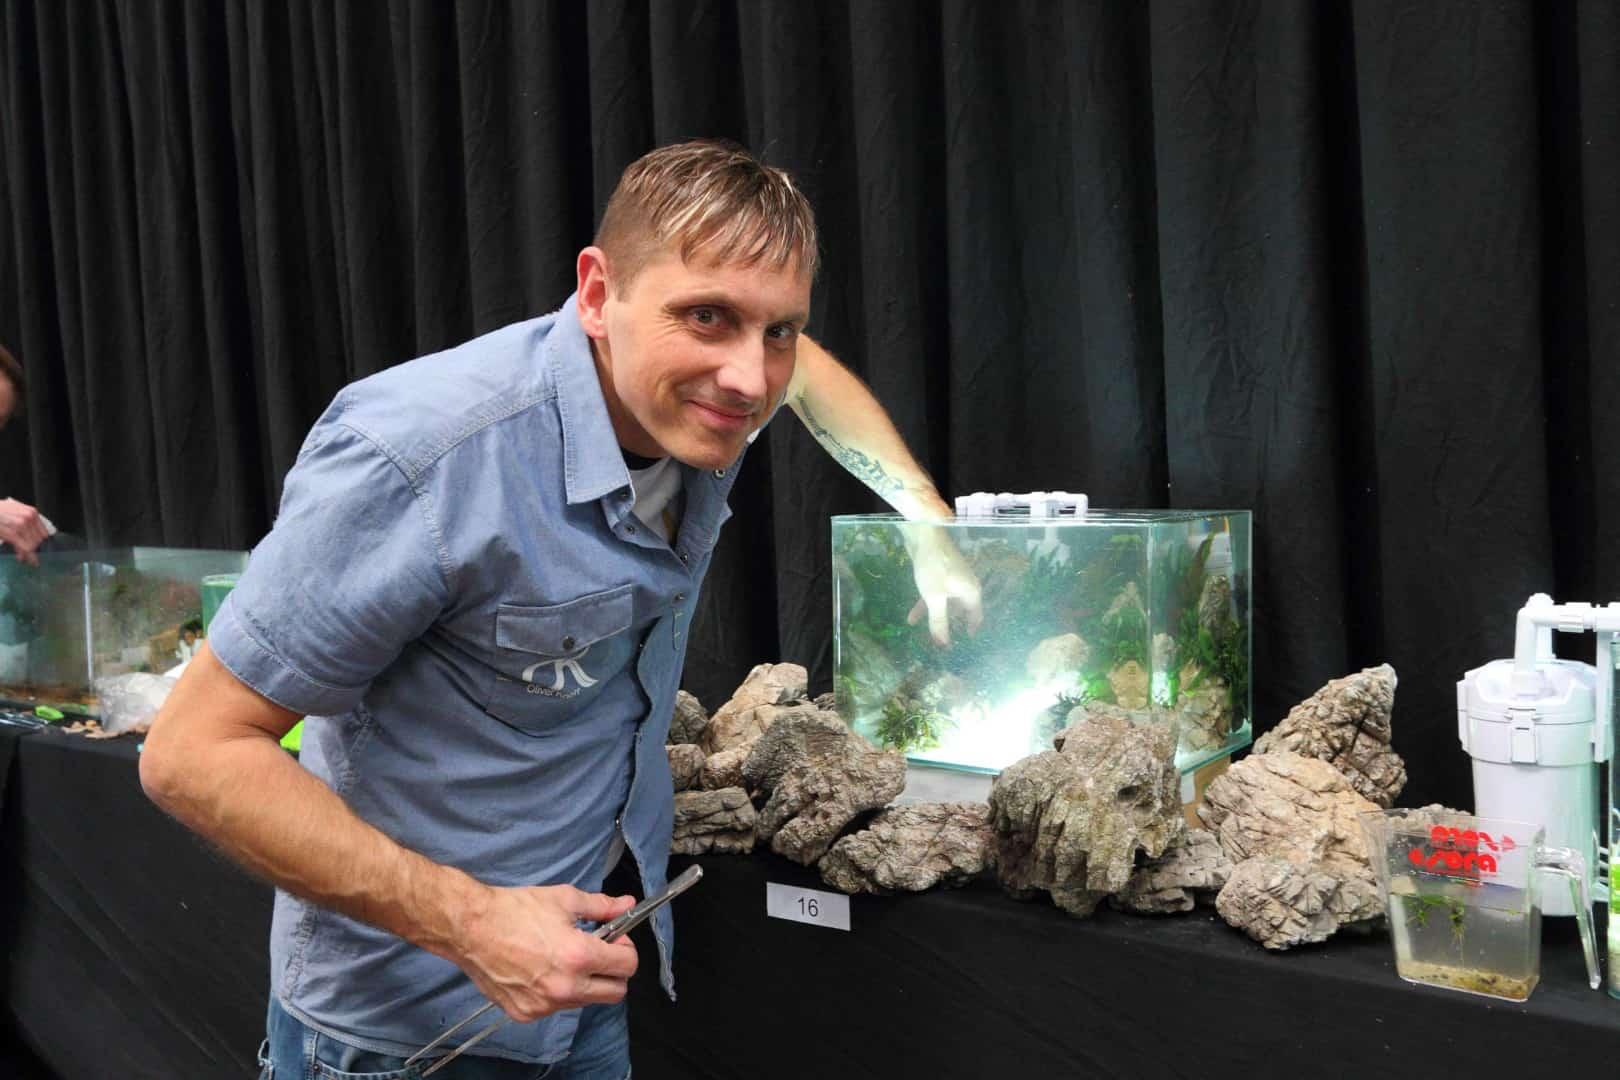 Podcast Episode #98: The Art Of The Planted Aquarium (Harald Soßna) 6